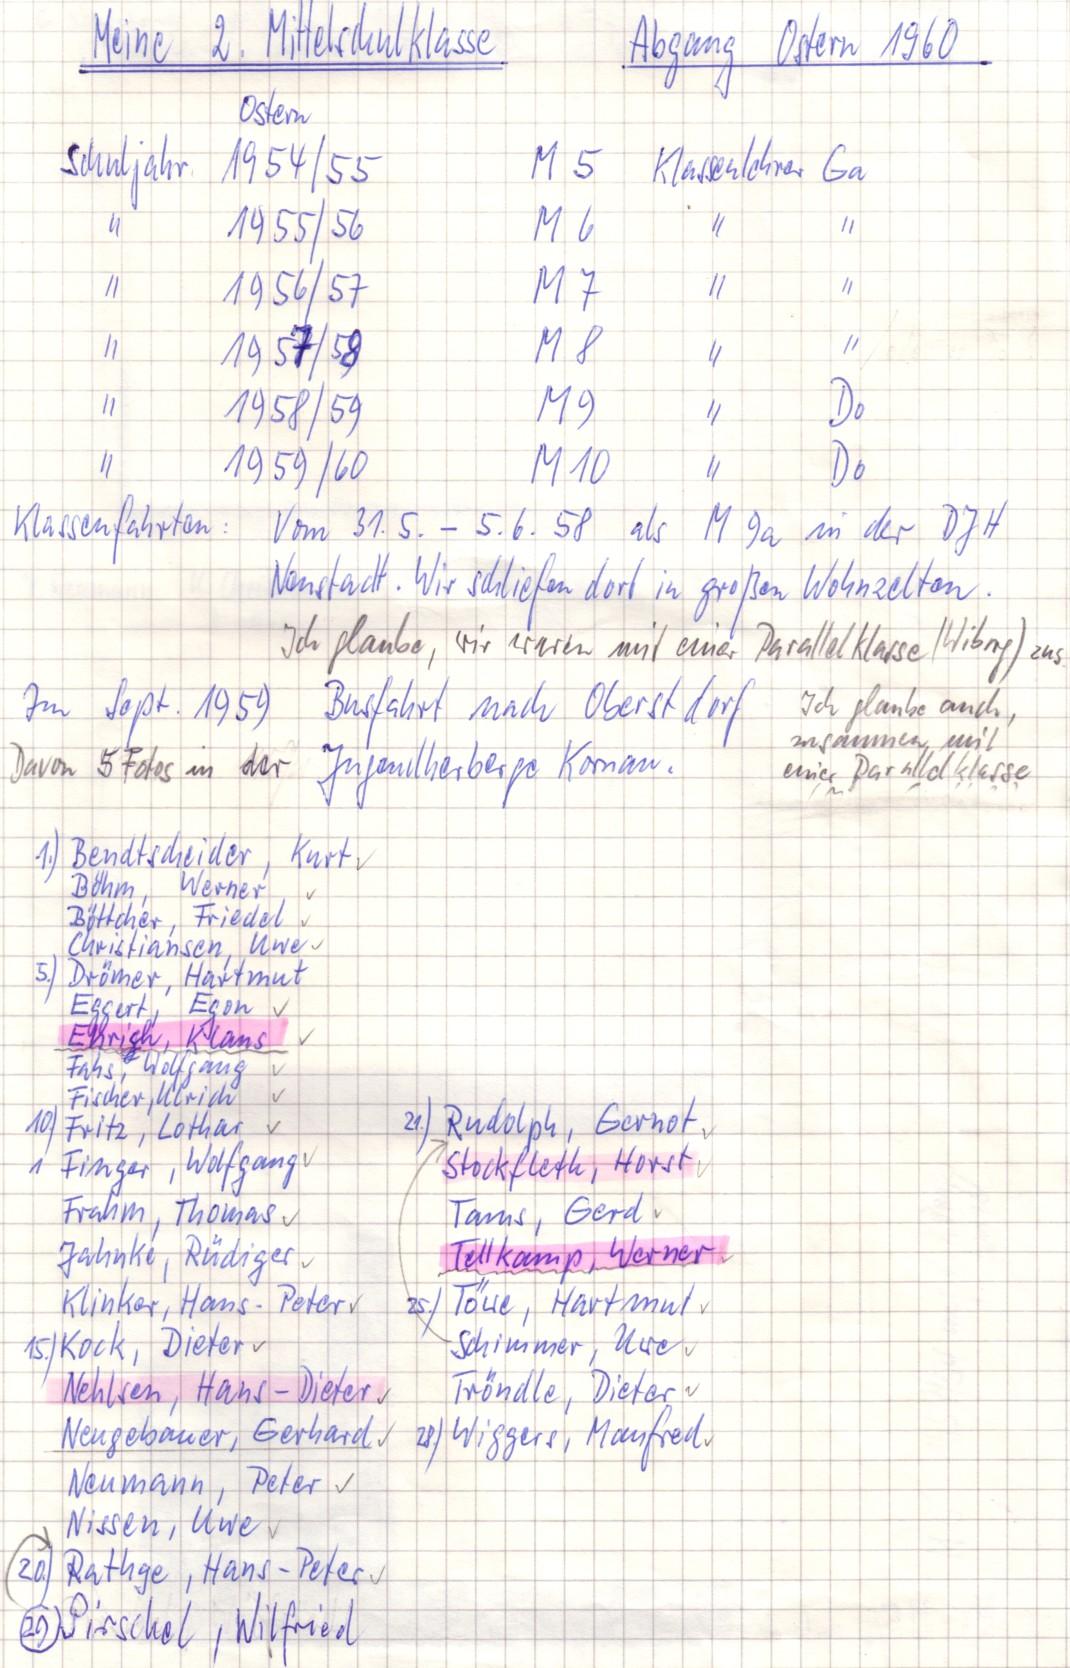 Schüler 1960 Das Virtuelle Klassentreffen Part 2